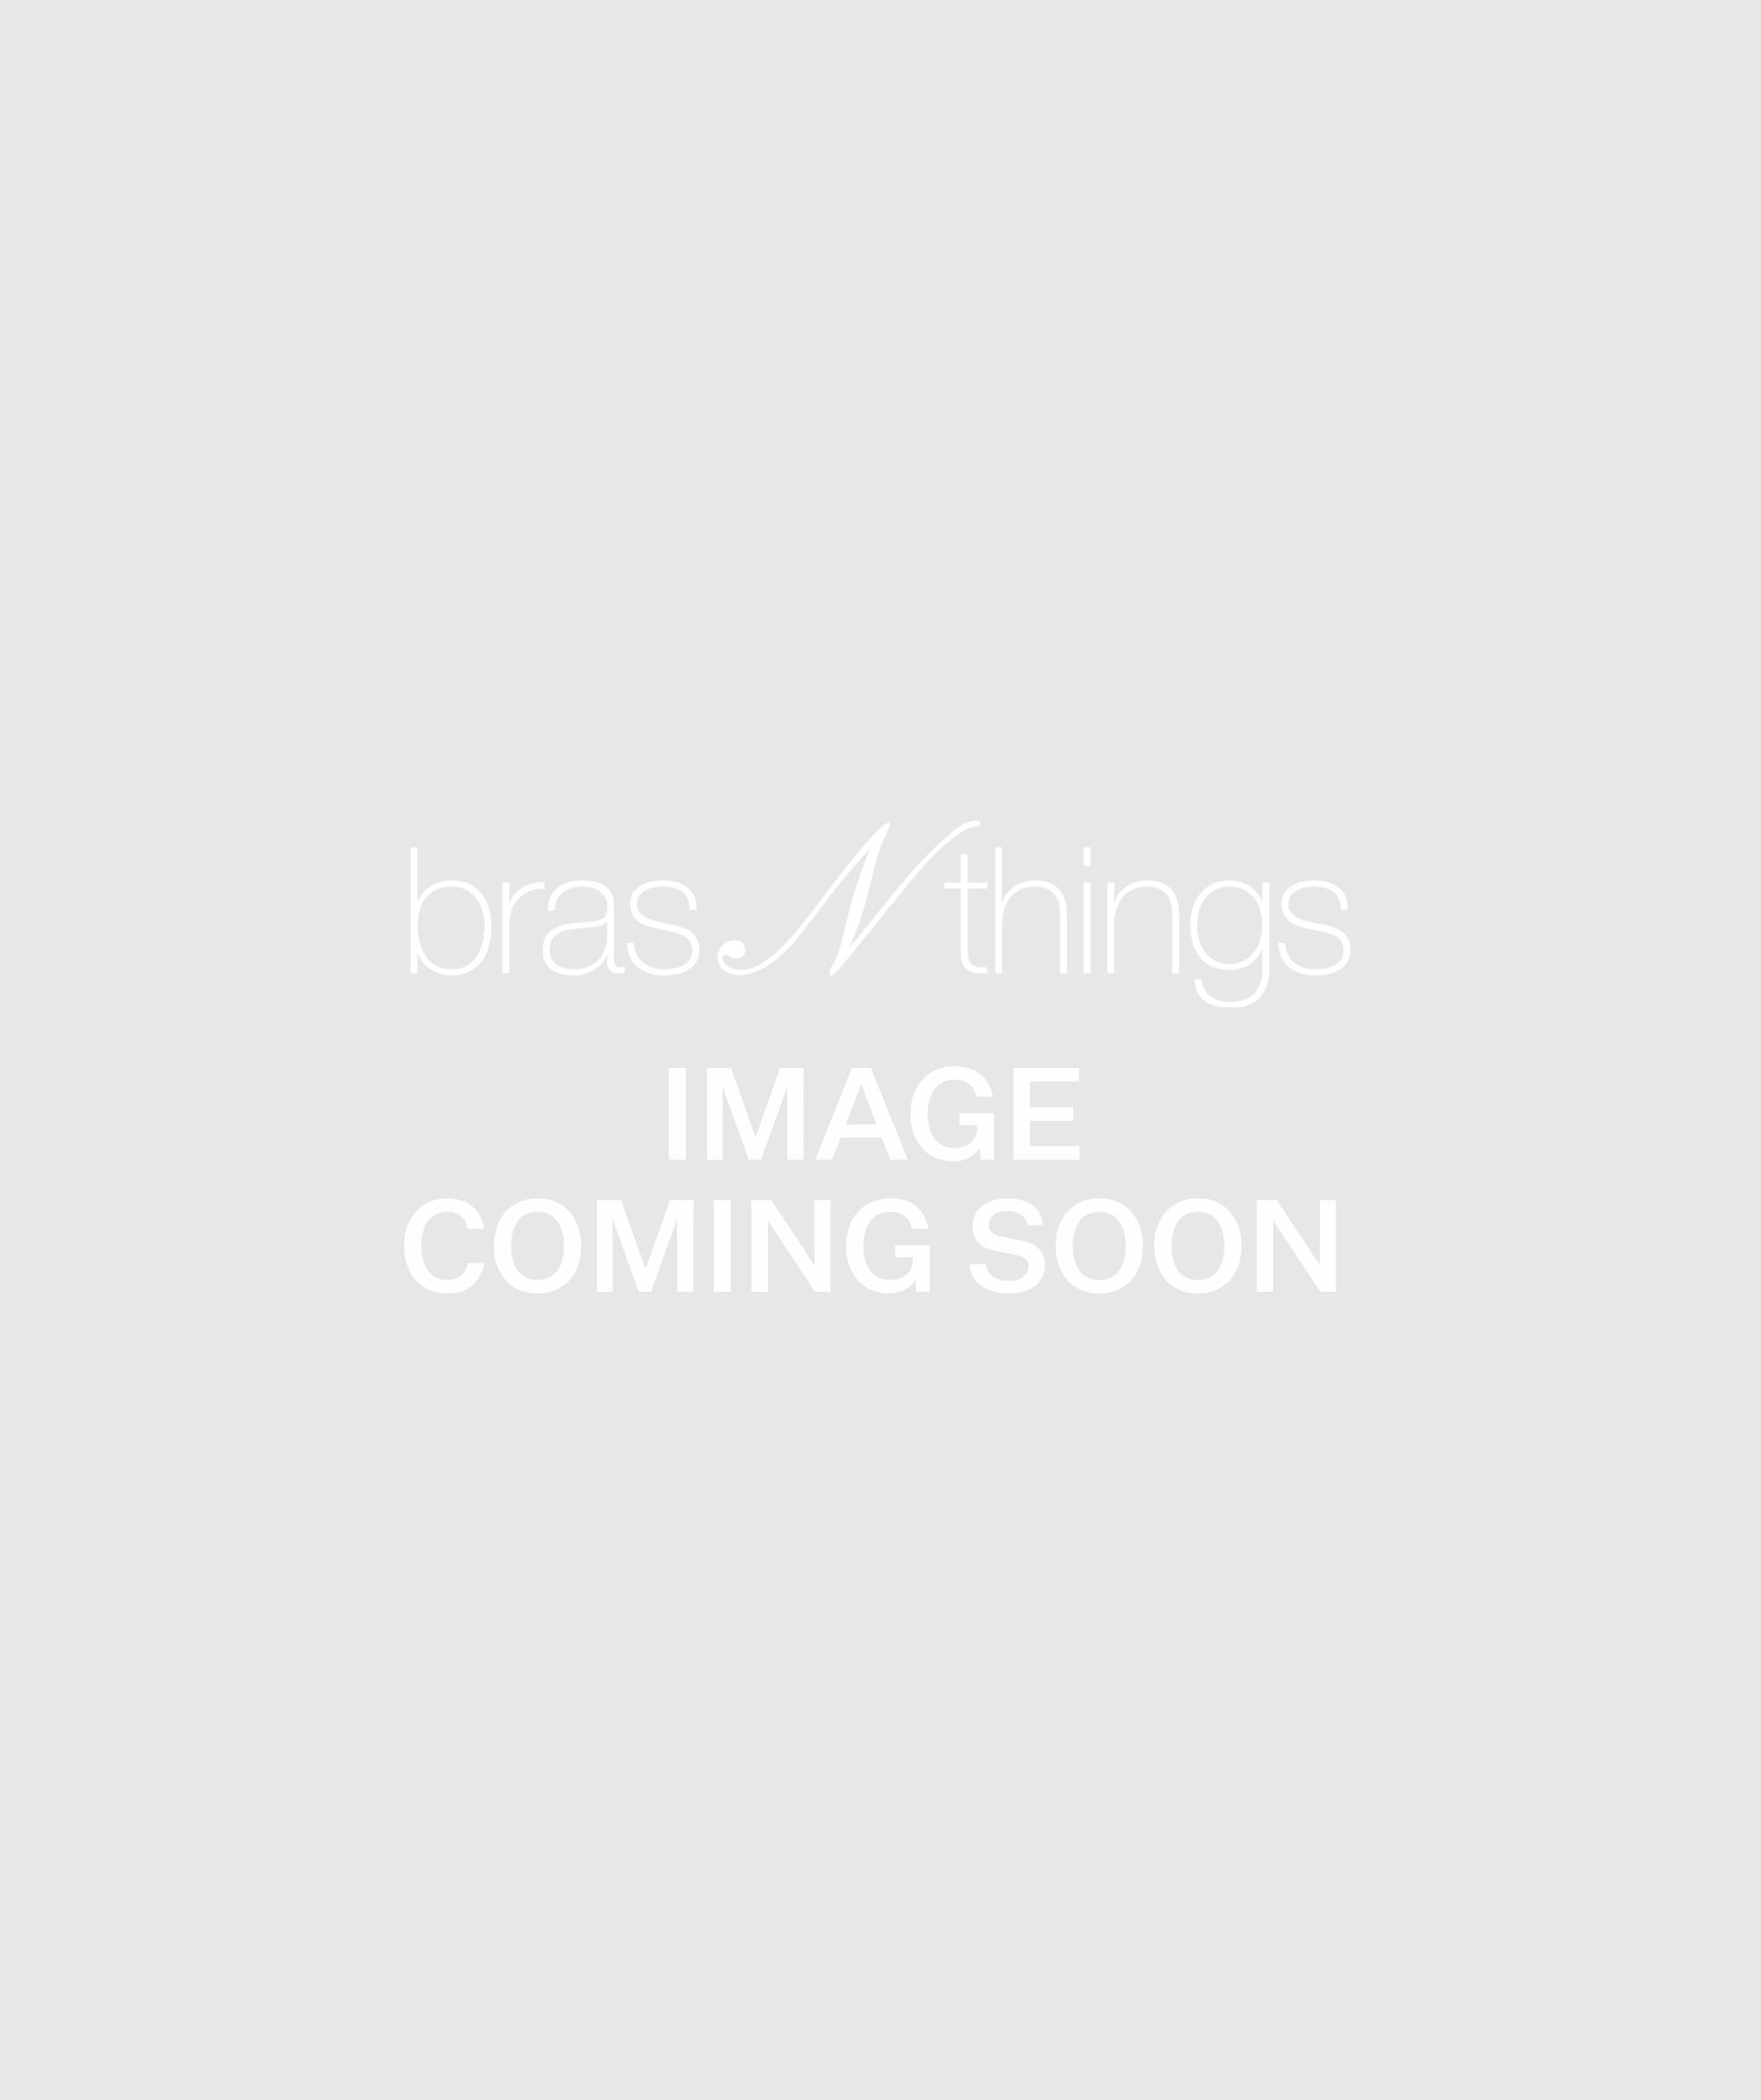 Kylie Plunge Long Line Contour Bra - Ivory/ Black